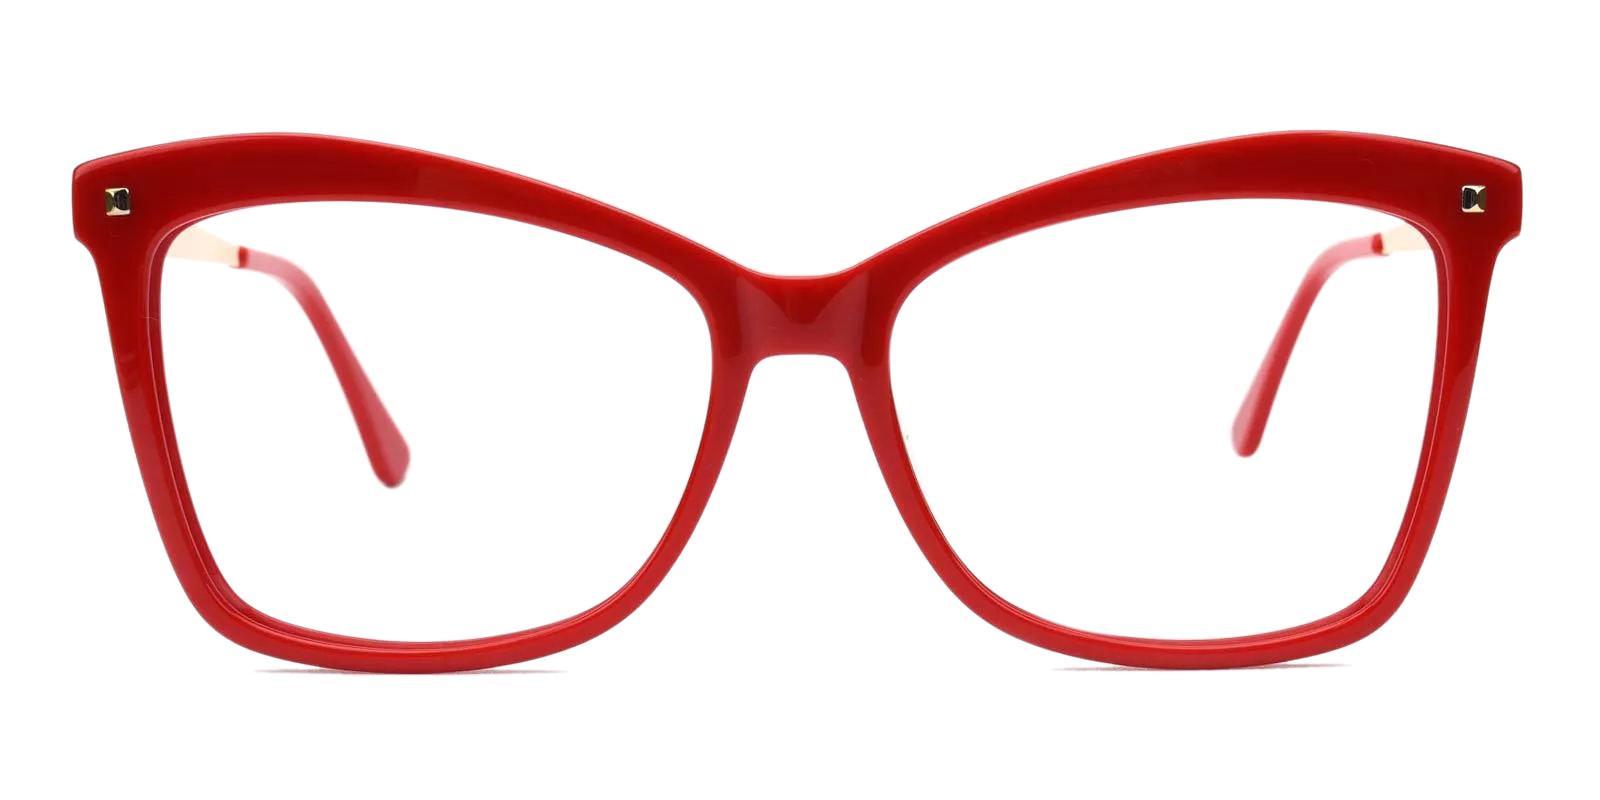 Bertha Red Acetate , Metal Eyeglasses , Fashion , UniversalBridgeFit Frames from ABBE Glasses